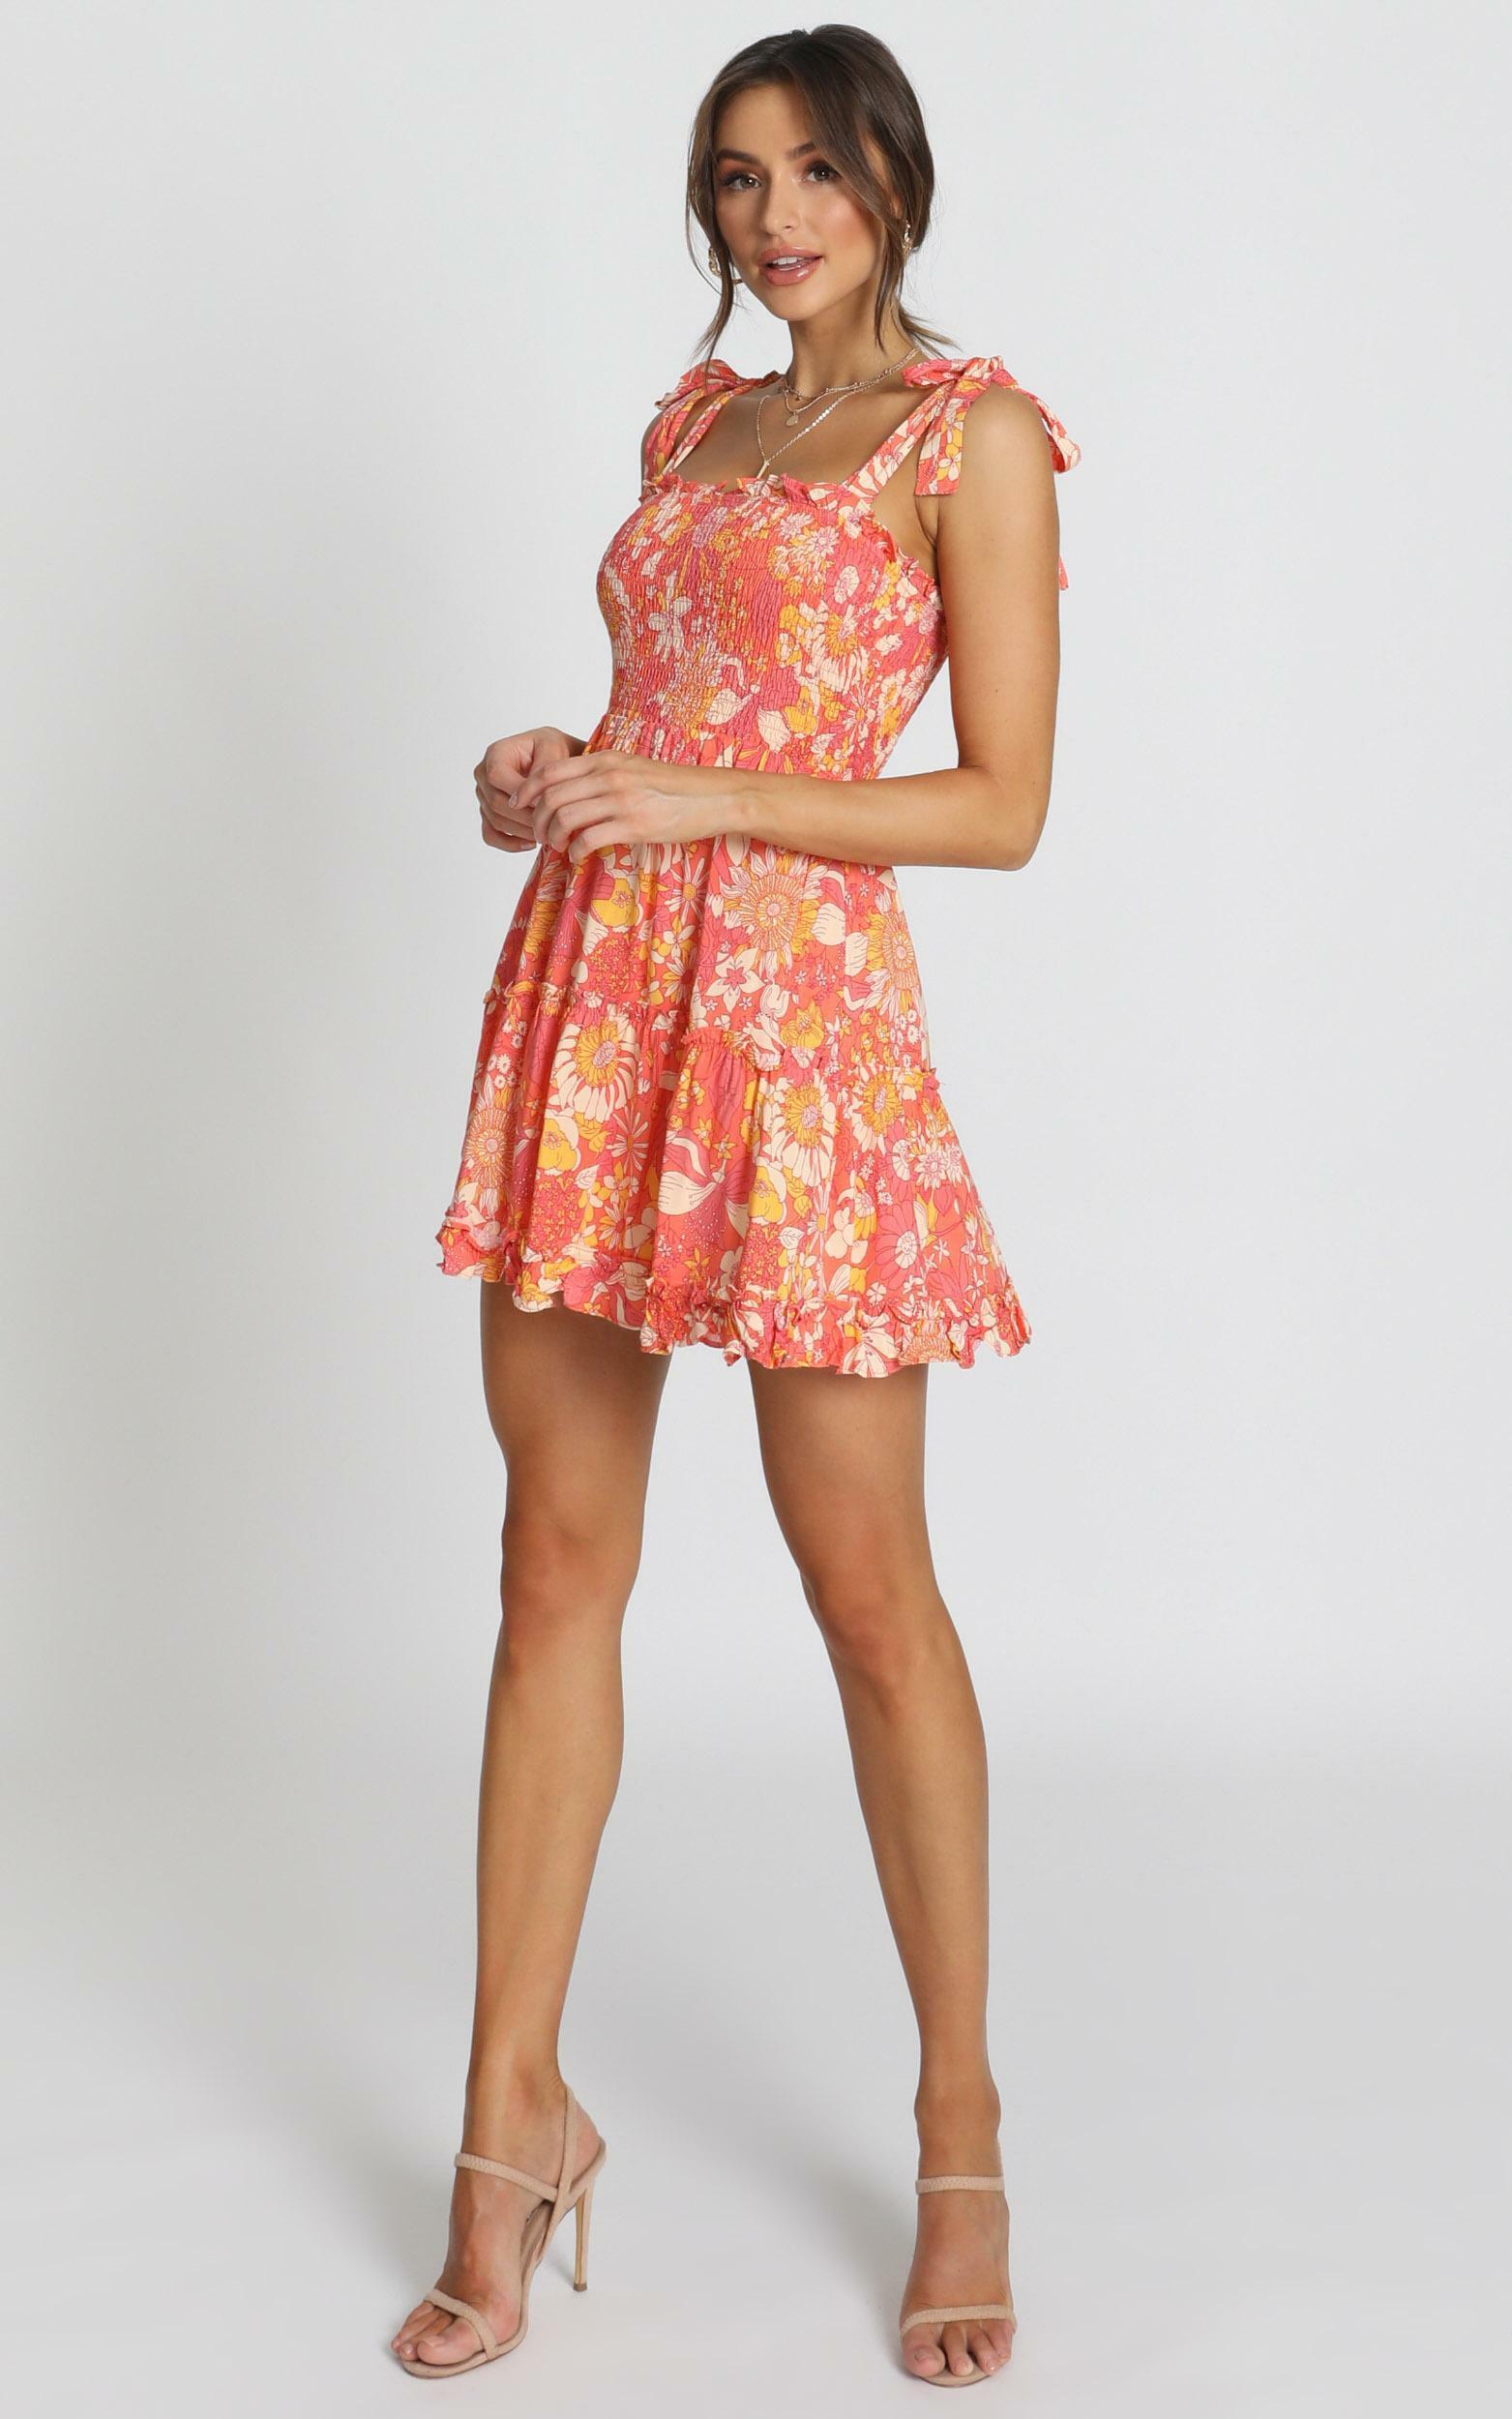 Austin Dress in red floral - 12 (L), Red, hi-res image number null